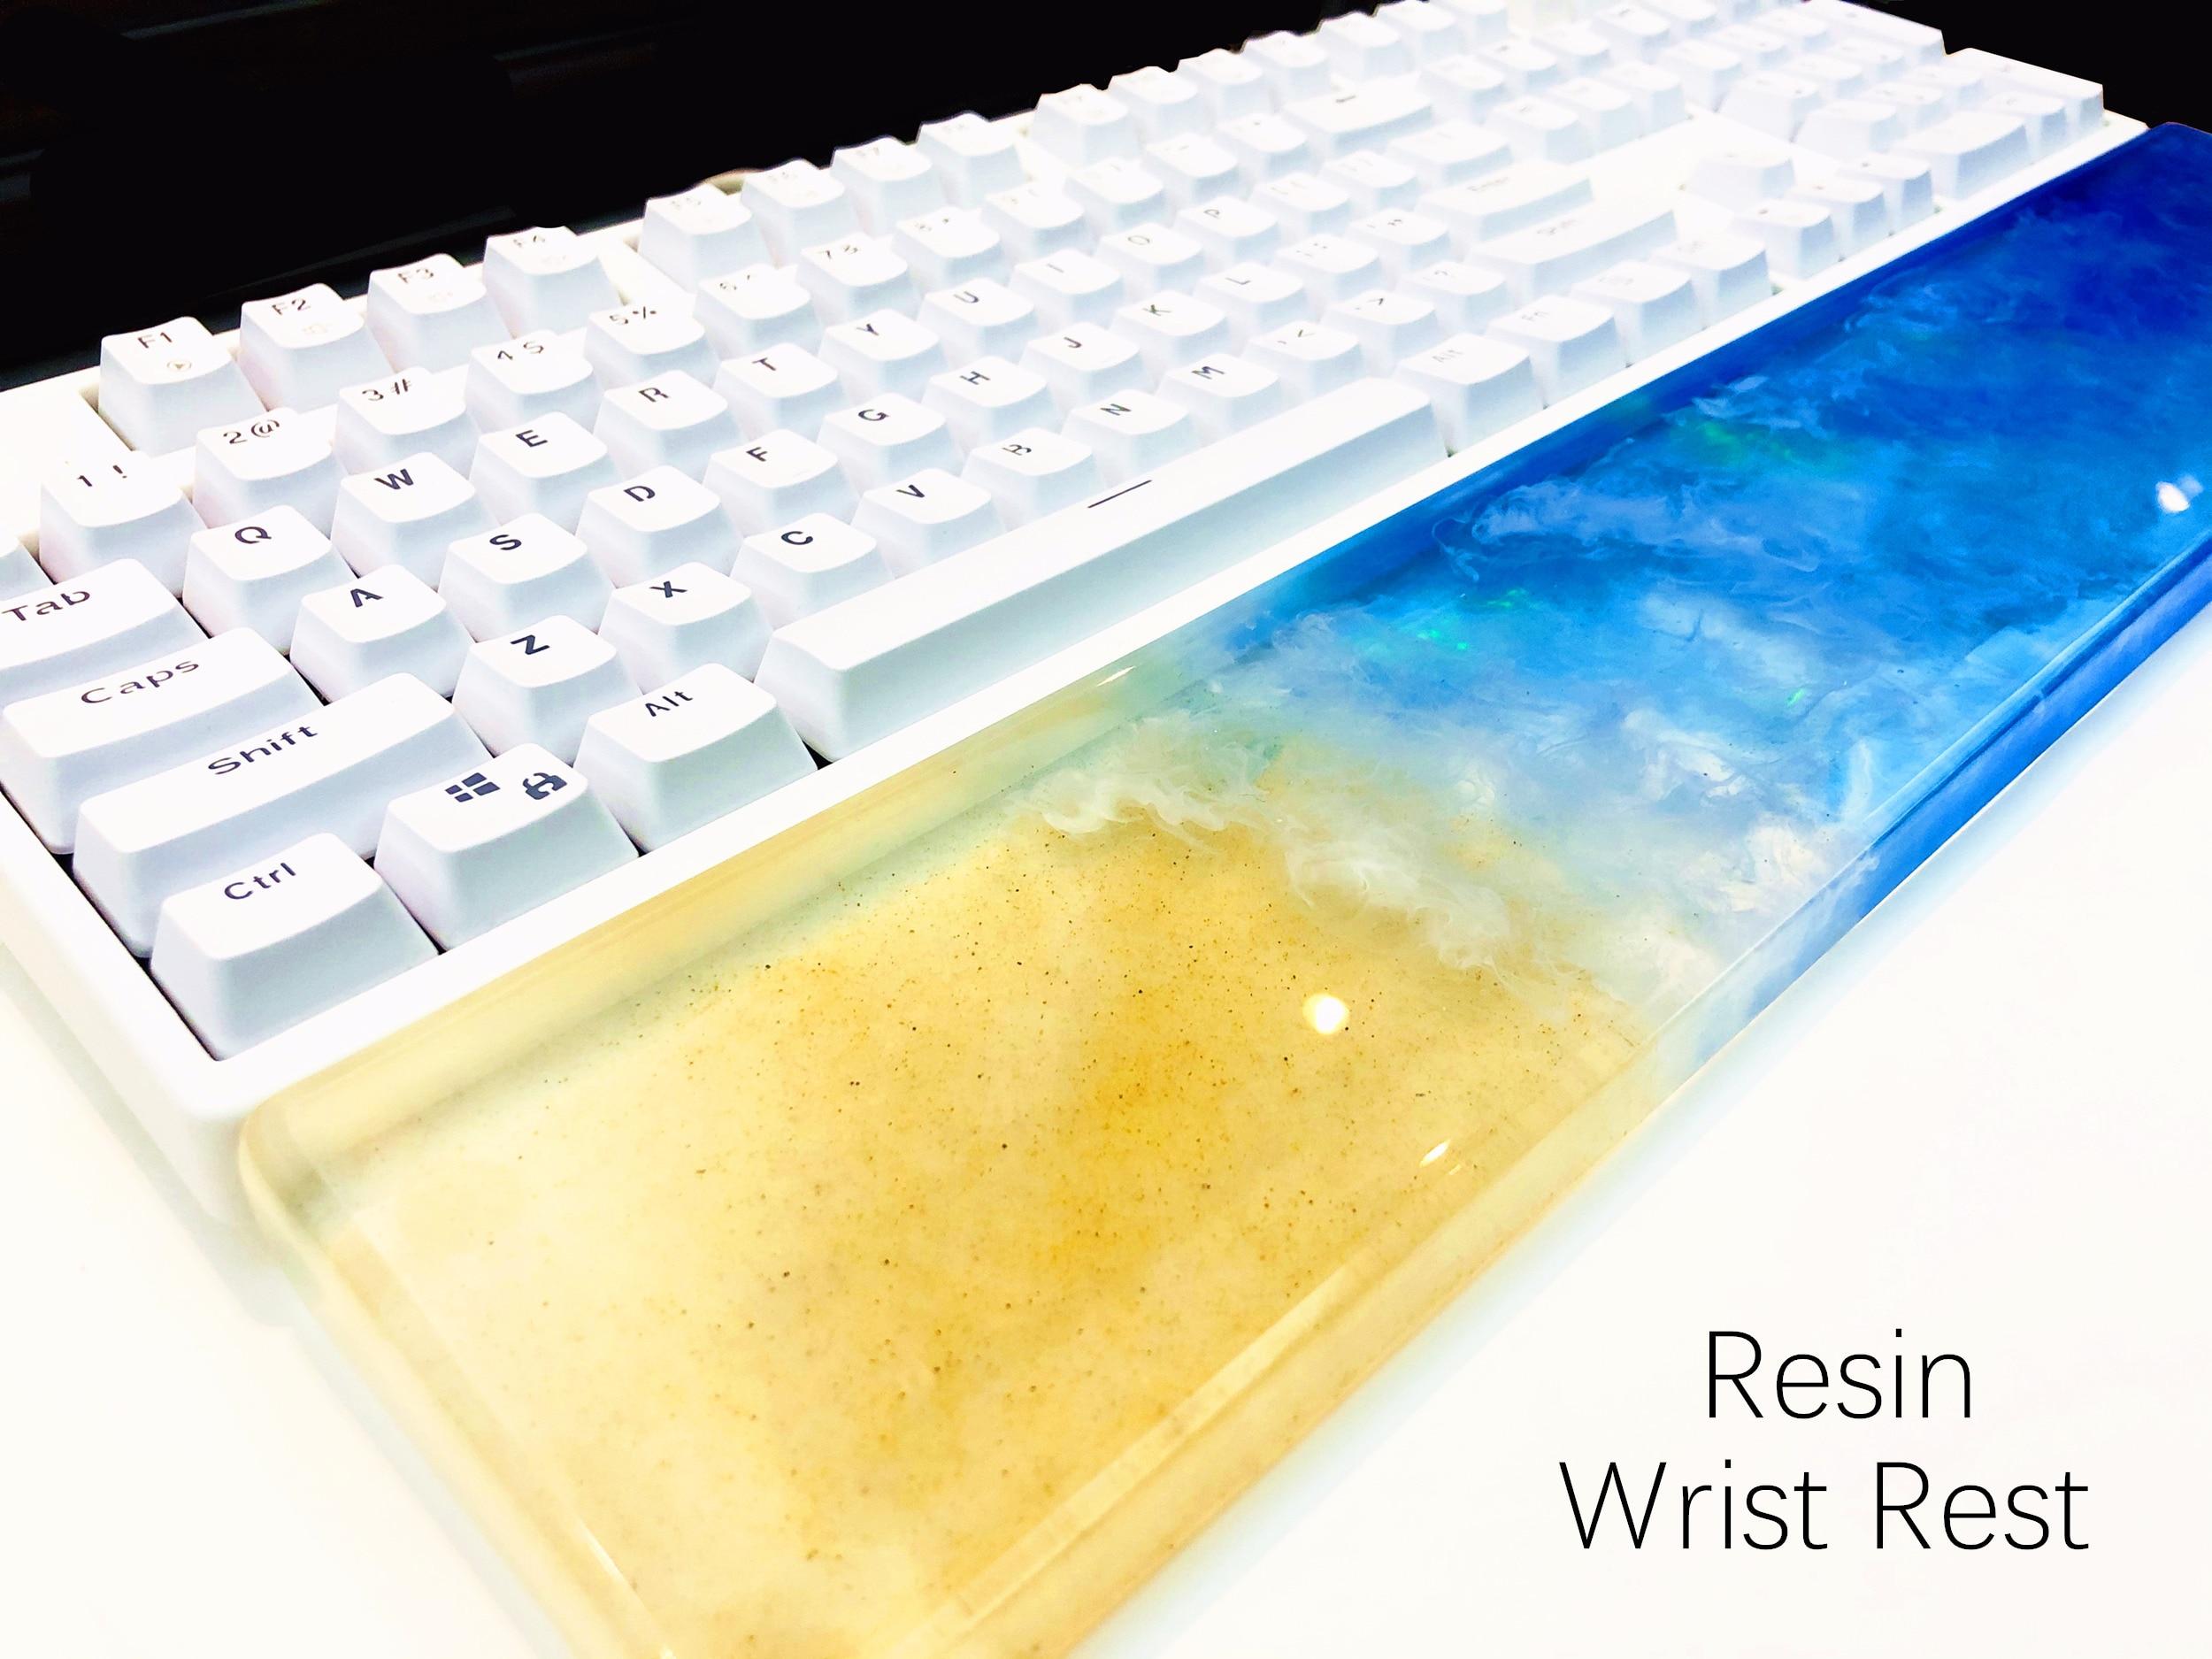 Hawaii Beach Resin Wrist Rest Handmade Transparent Resin Artisan Wrist Pad Ergonomic For 87 104 Keys Mechanical Gaming Keyboard